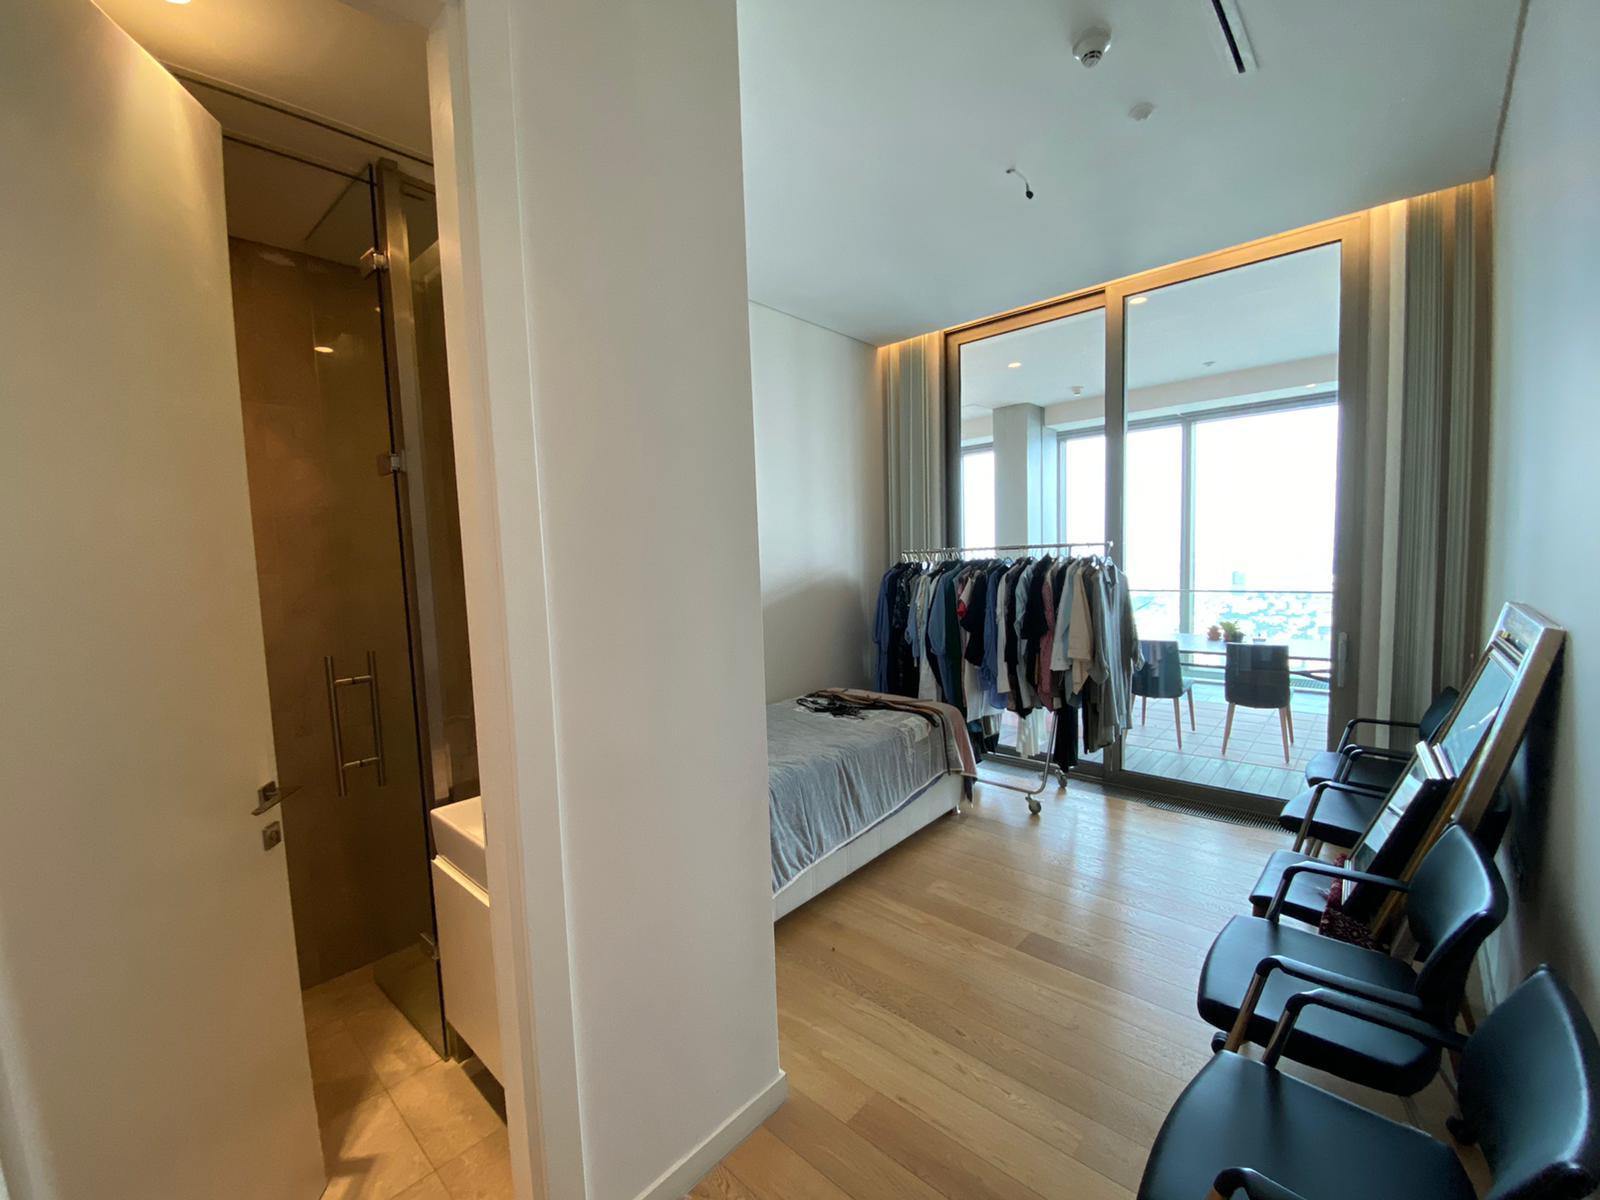 penthouse-istanbul-sapphire-tower-42th-floor-012.jpg